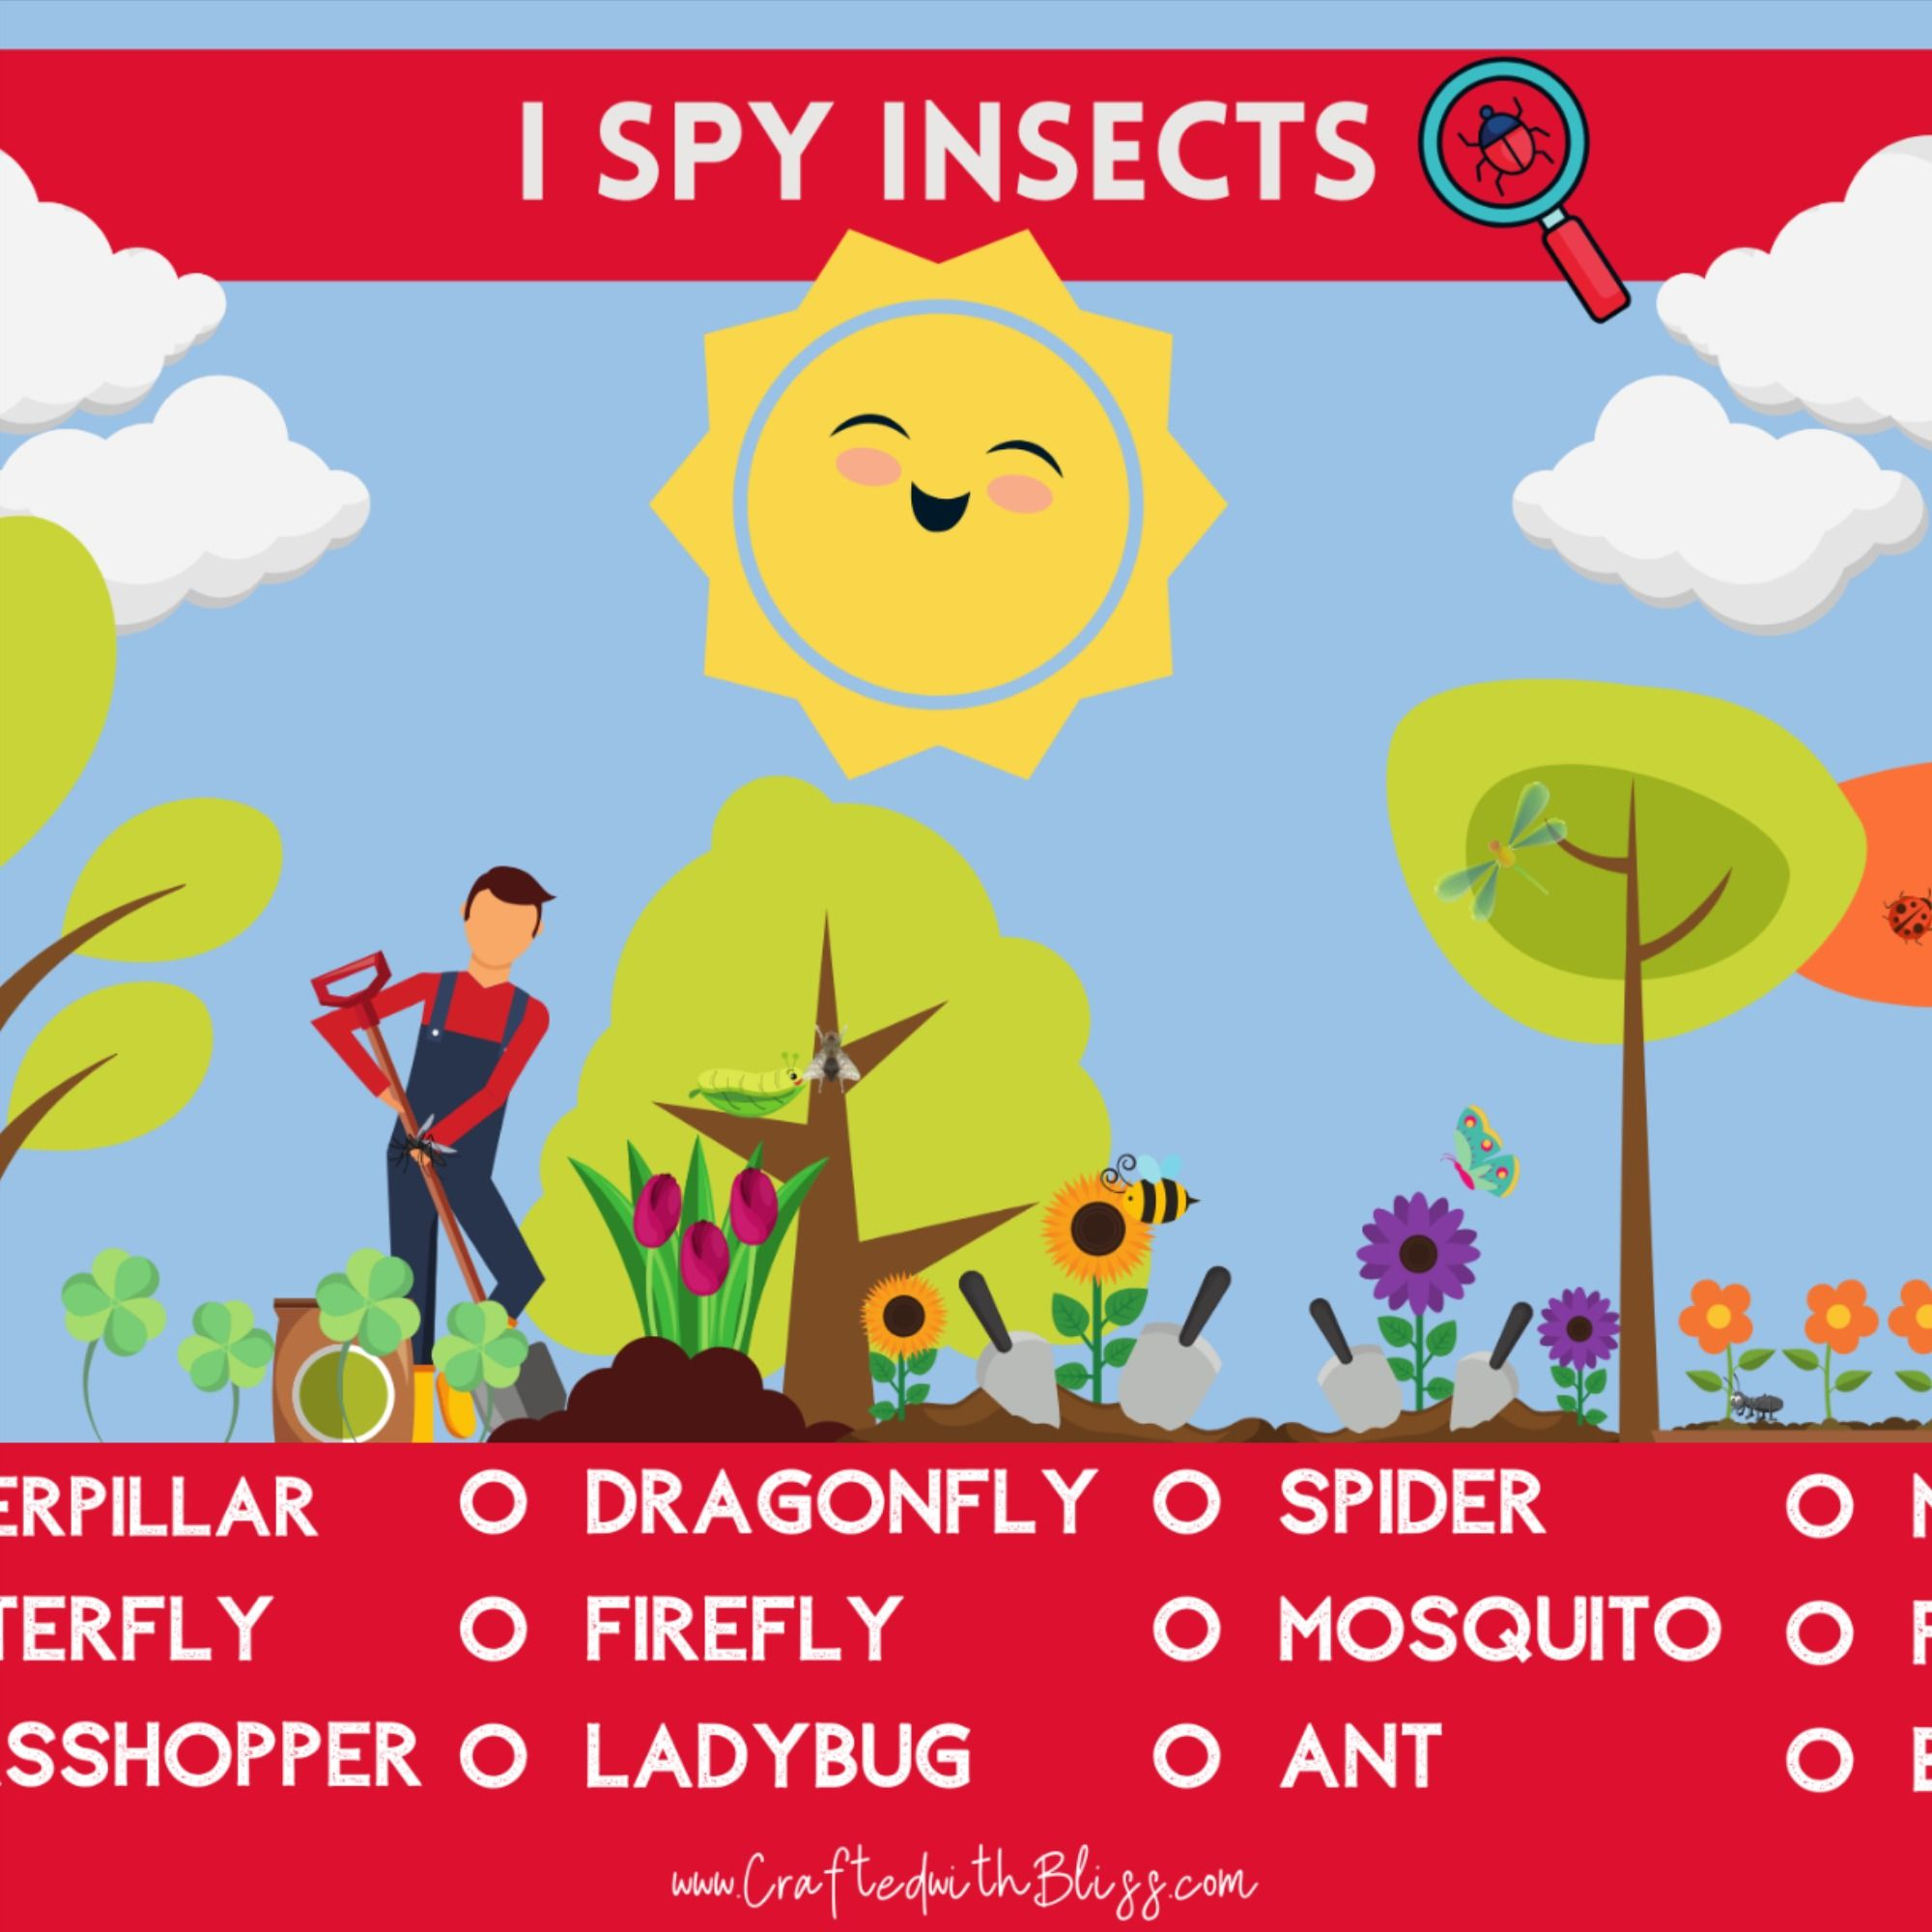 I Spy Everywhere Printables For Kids Preschool Etsy Fine Motor Activities For Kids Halloween Activities For Kids Fun Games For Kids [ 2000 x 2000 Pixel ]